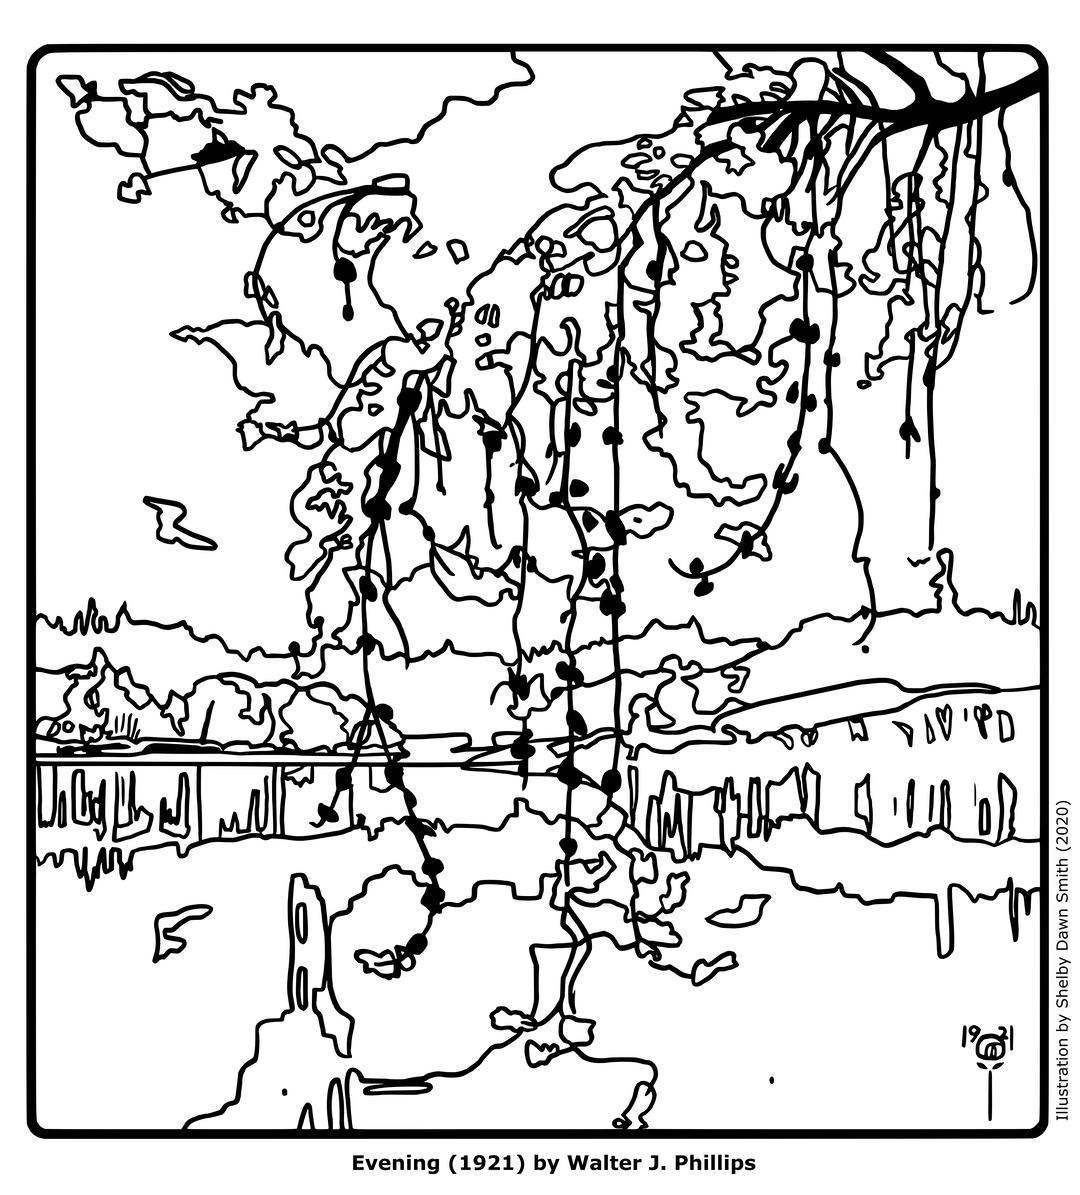 Evening (1921)